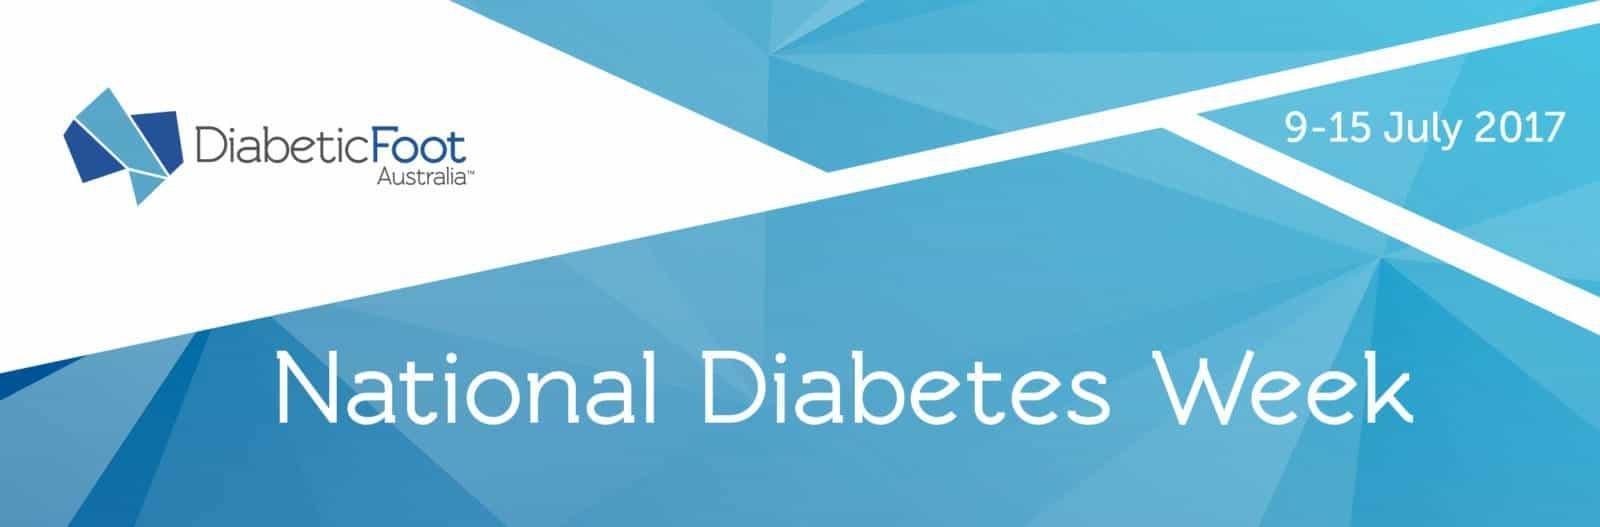 Welcome To Dfa Diabetes Week 2017